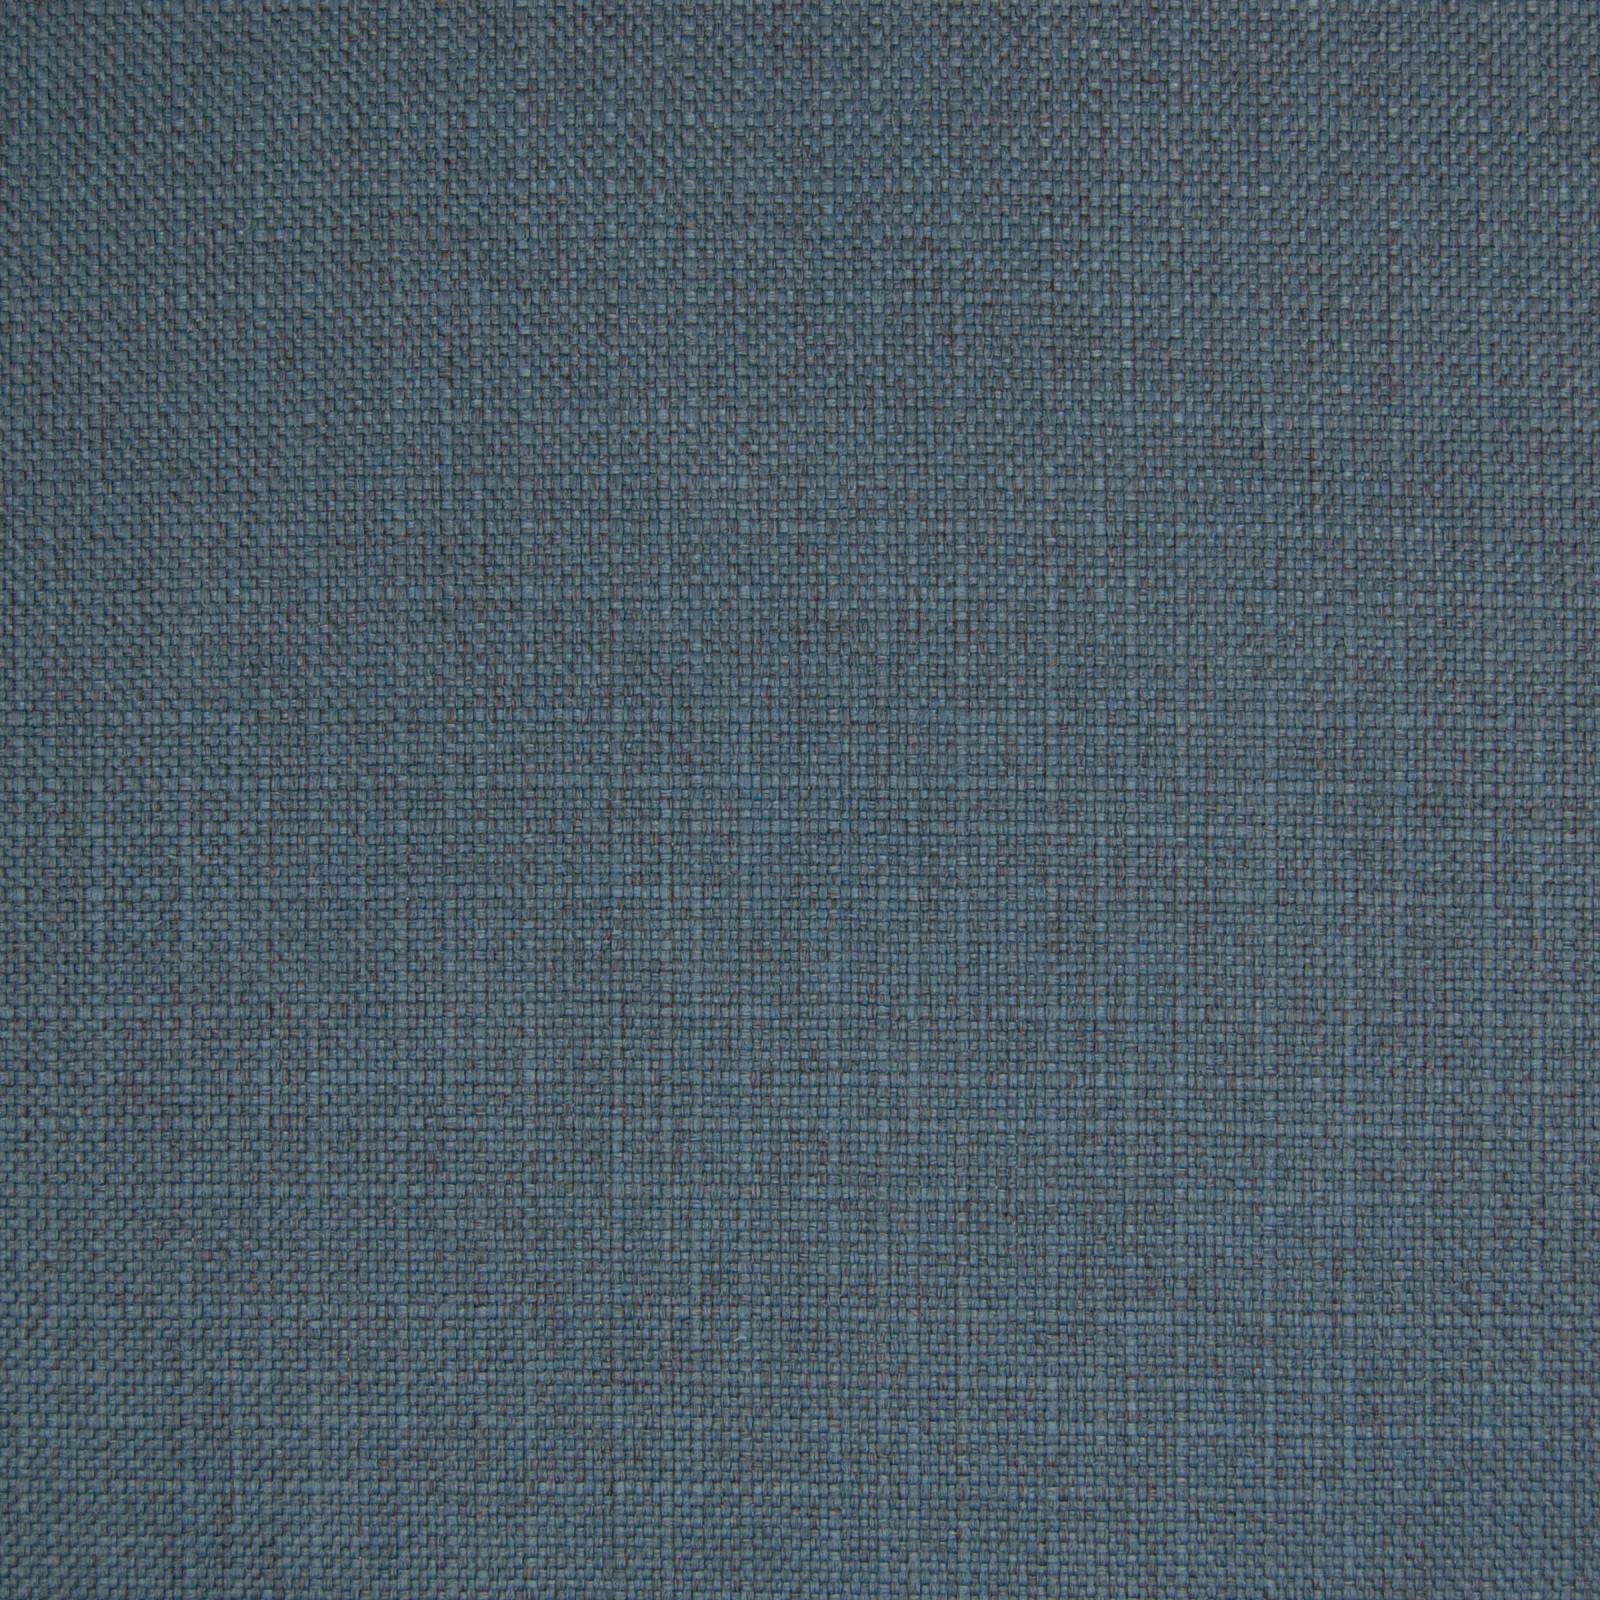 B6732 Navy Greenhouse Fabrics